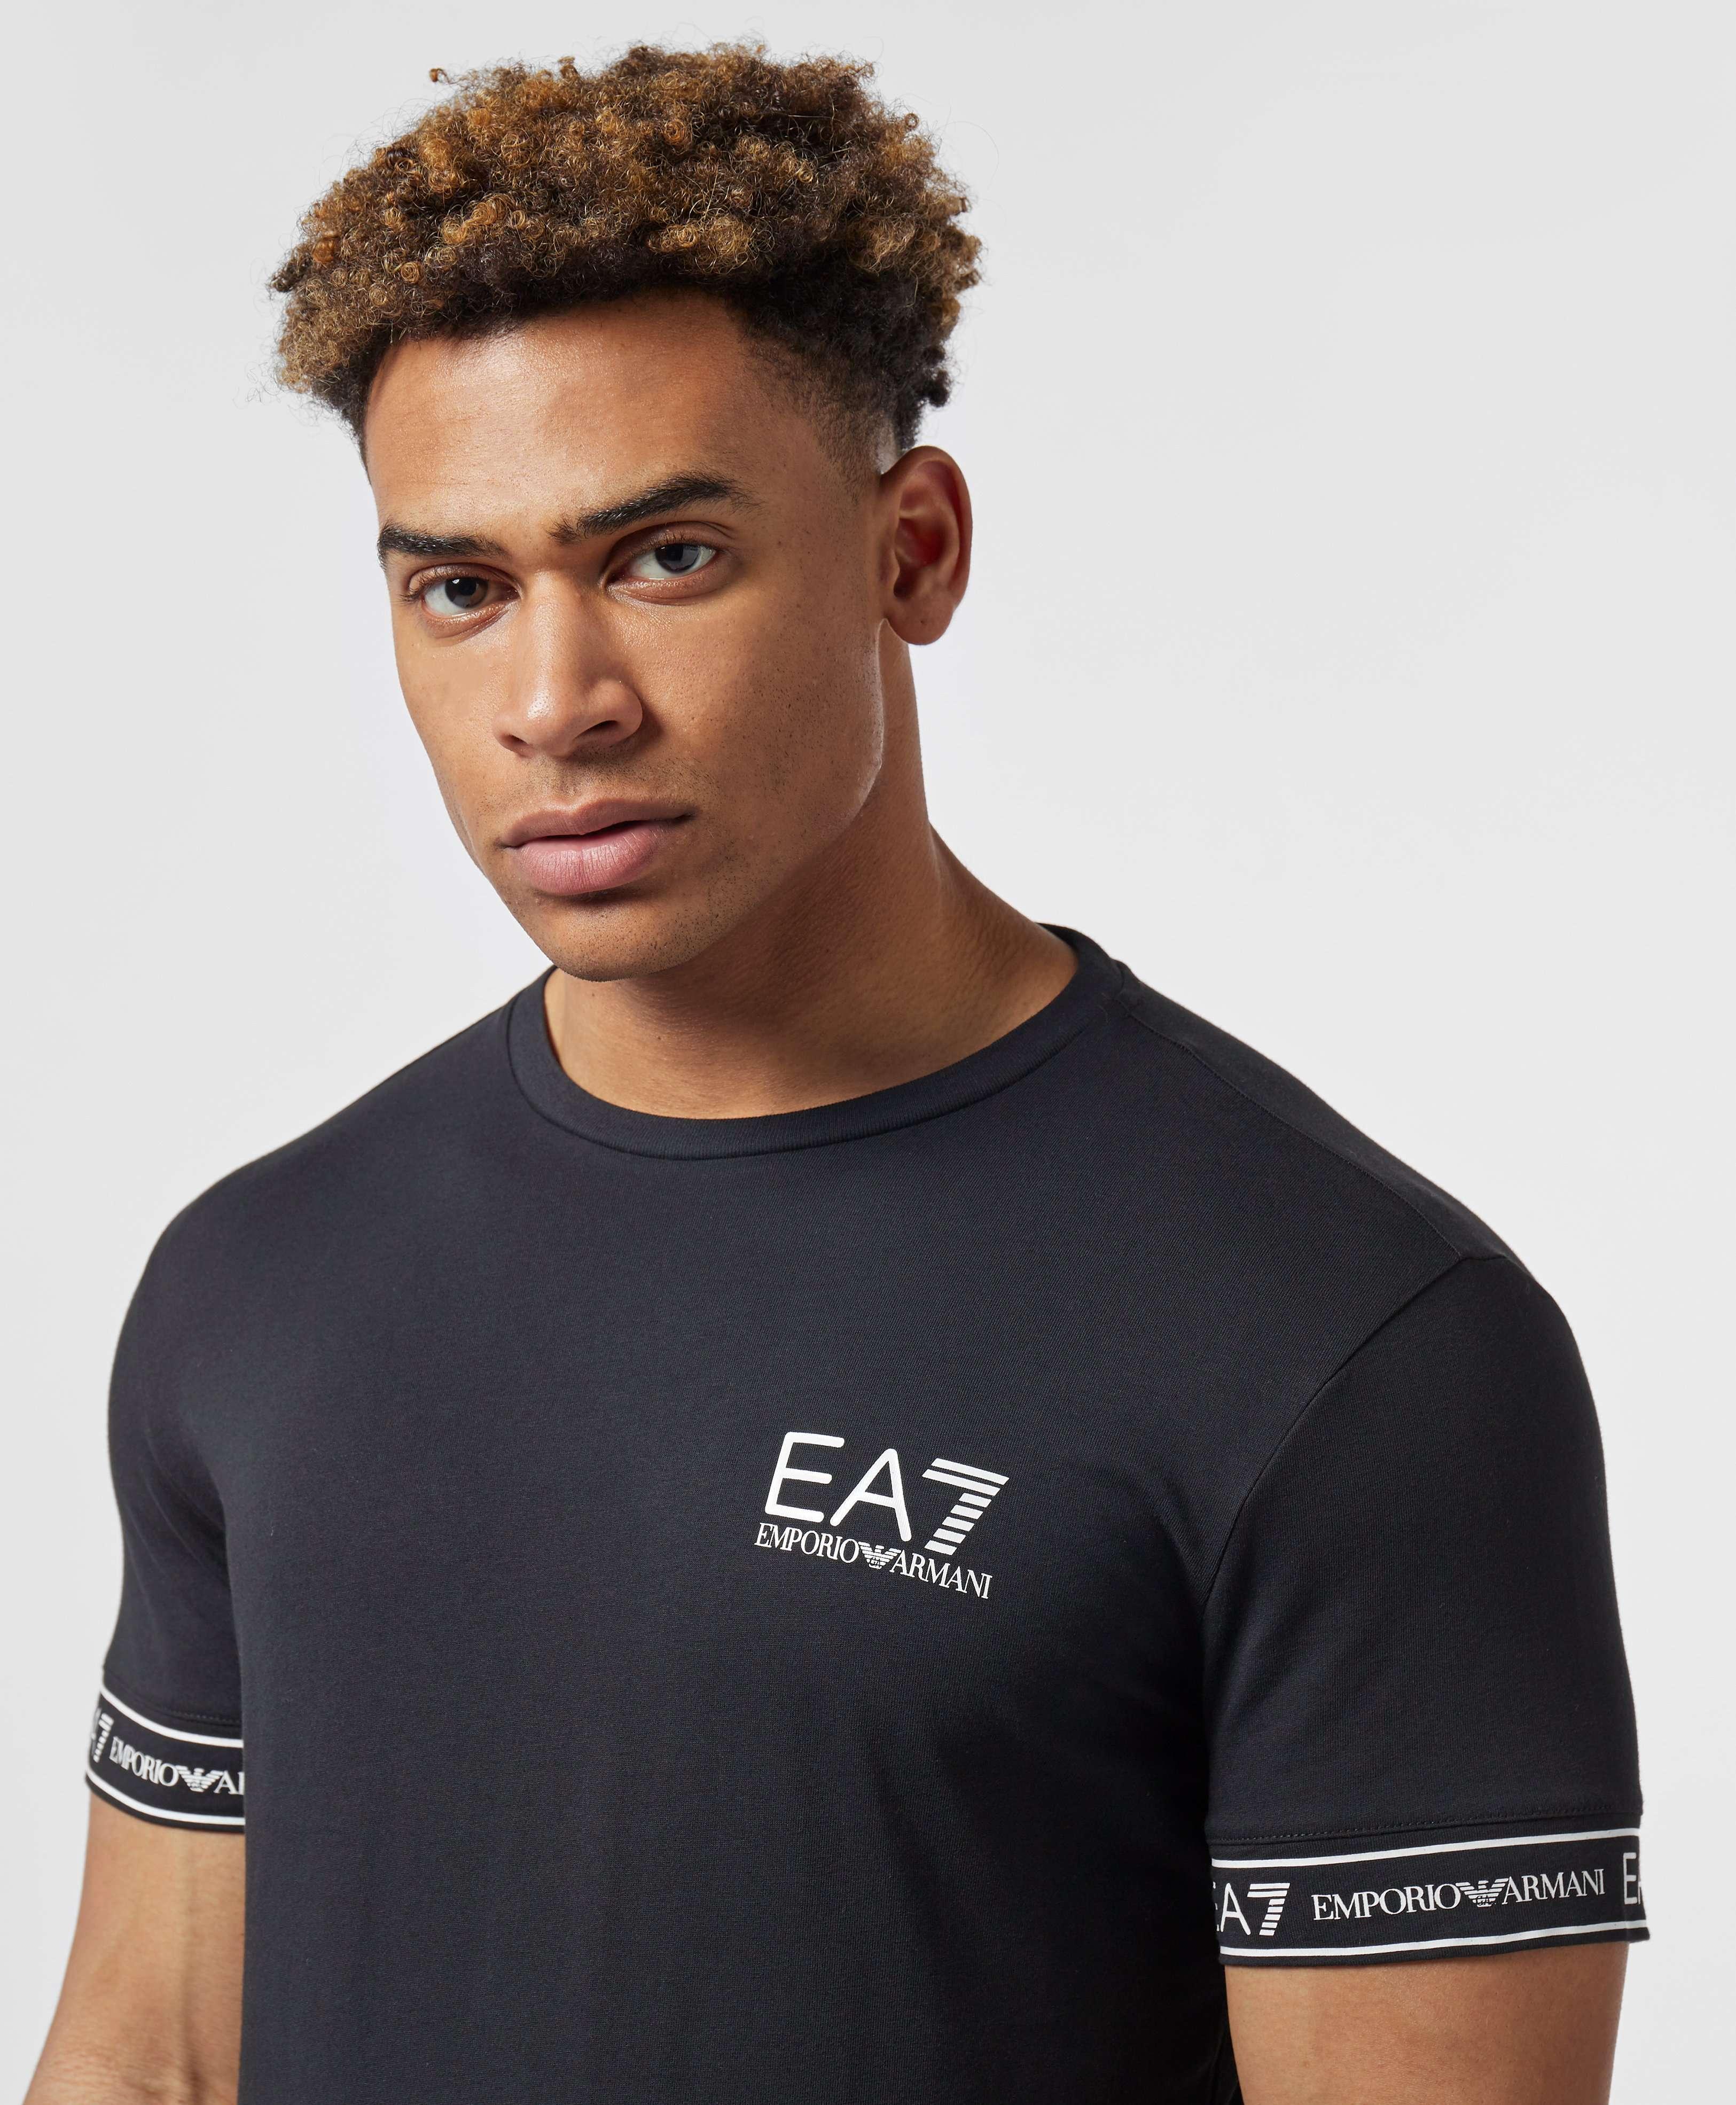 Emporio Armani EA7 Tape Cuff Short Sleeve T-Shirt